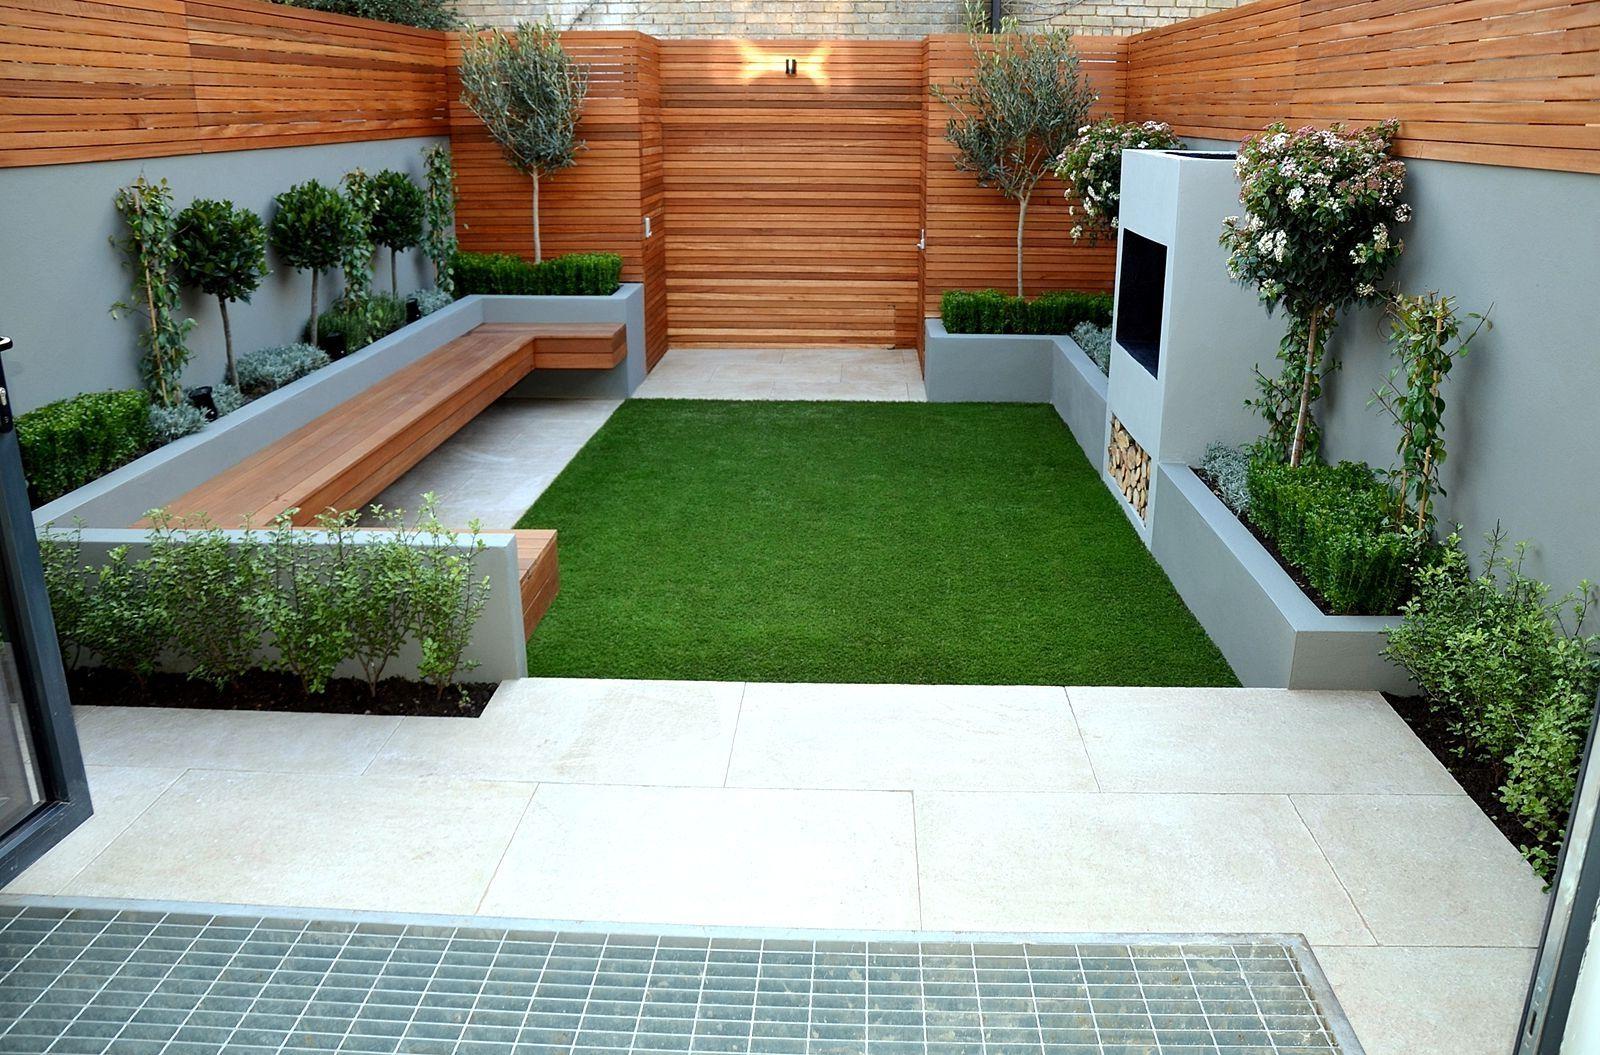 Small courtyard garden inspiration  Simple Small Garden Designs M The Garden Inspirations Small Garden